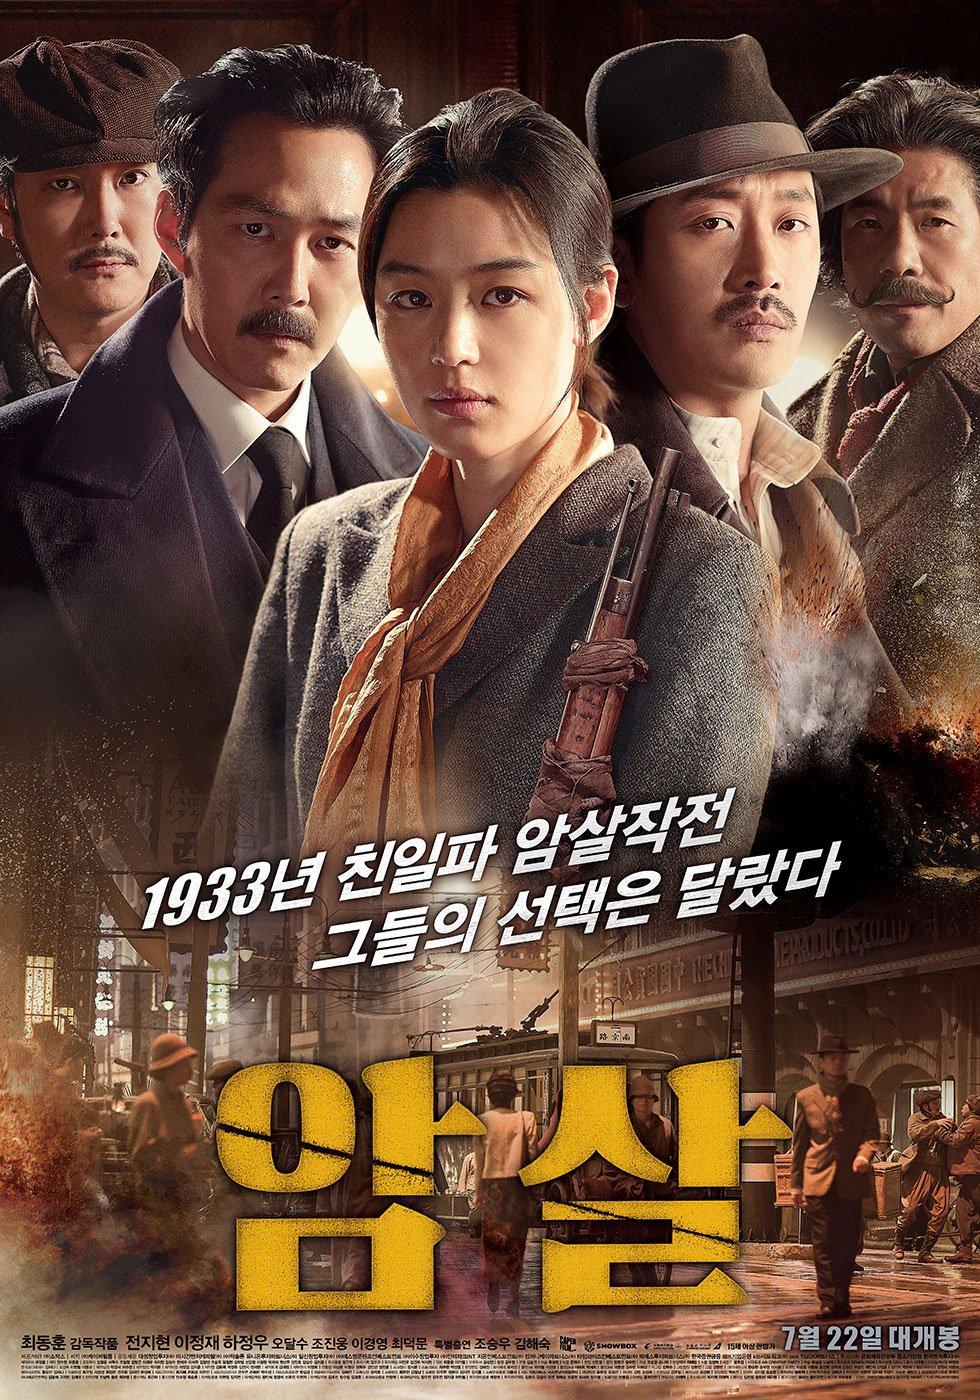 Sứ Mệnh Truy Sát - Assassination (2015)